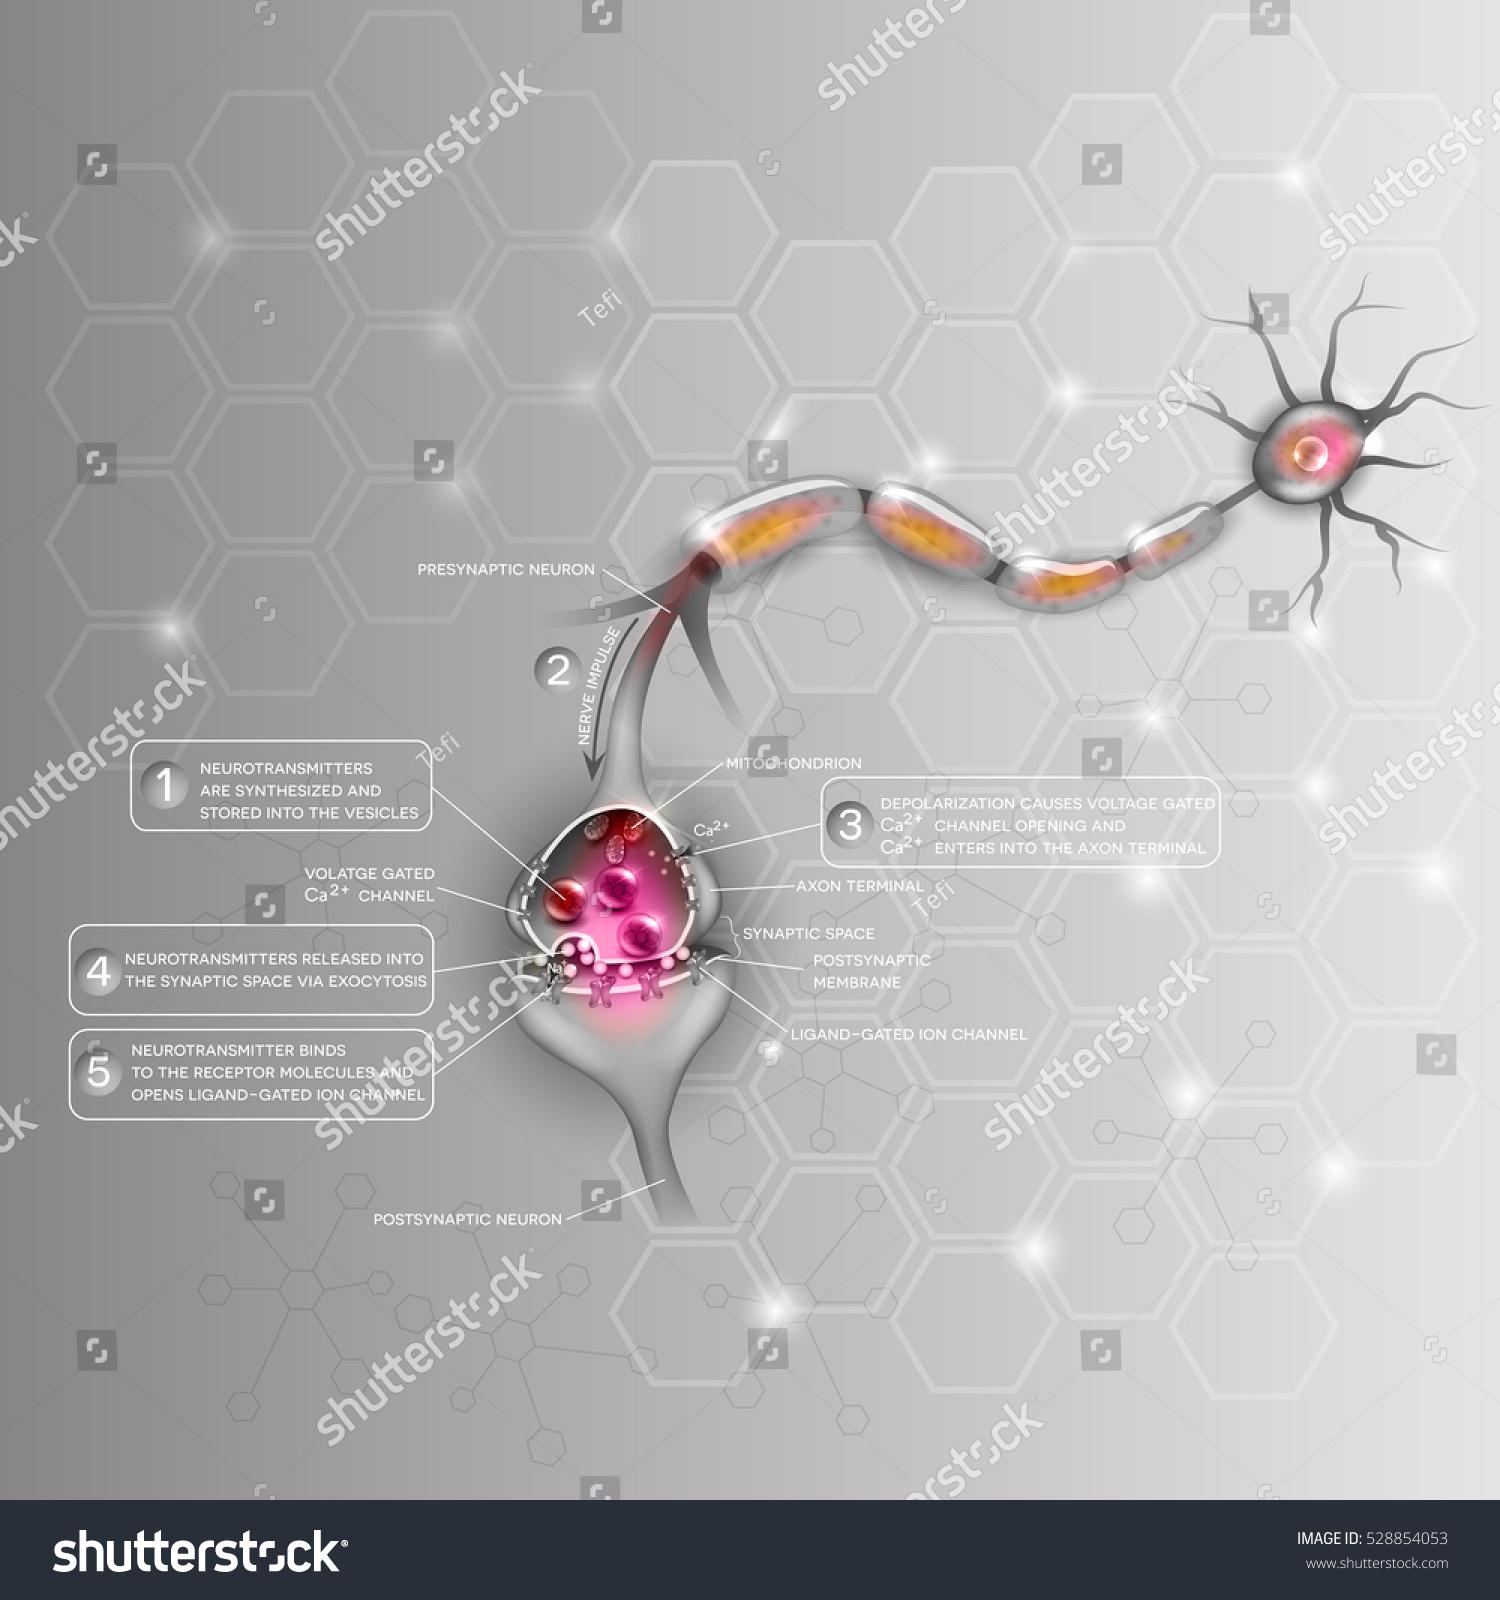 Synapse Detailed Anatomy Beautiful Colorful Illustration Stock ...